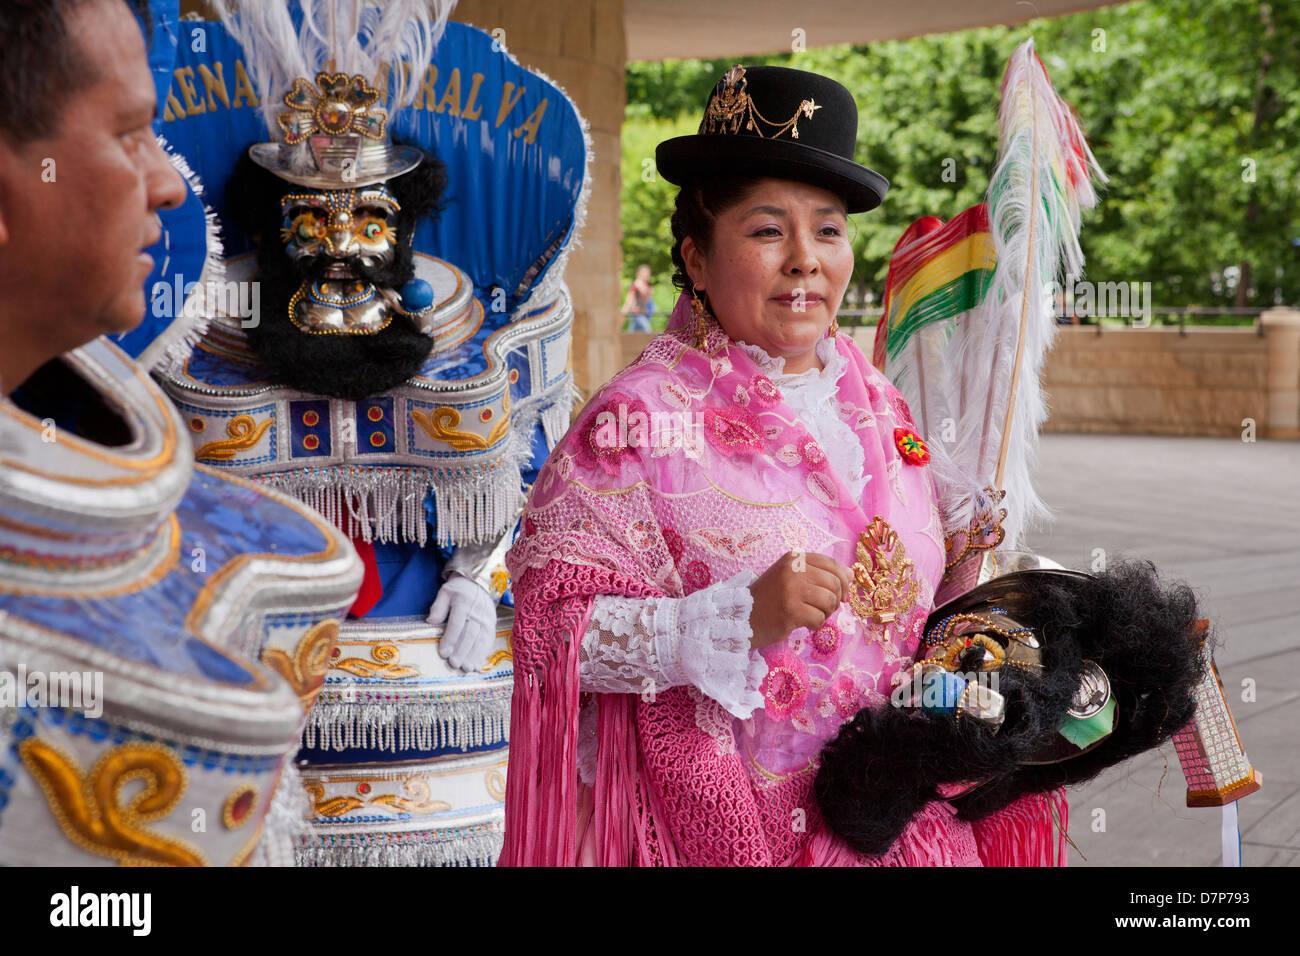 Traditional Bolivian dancer - Stock Image